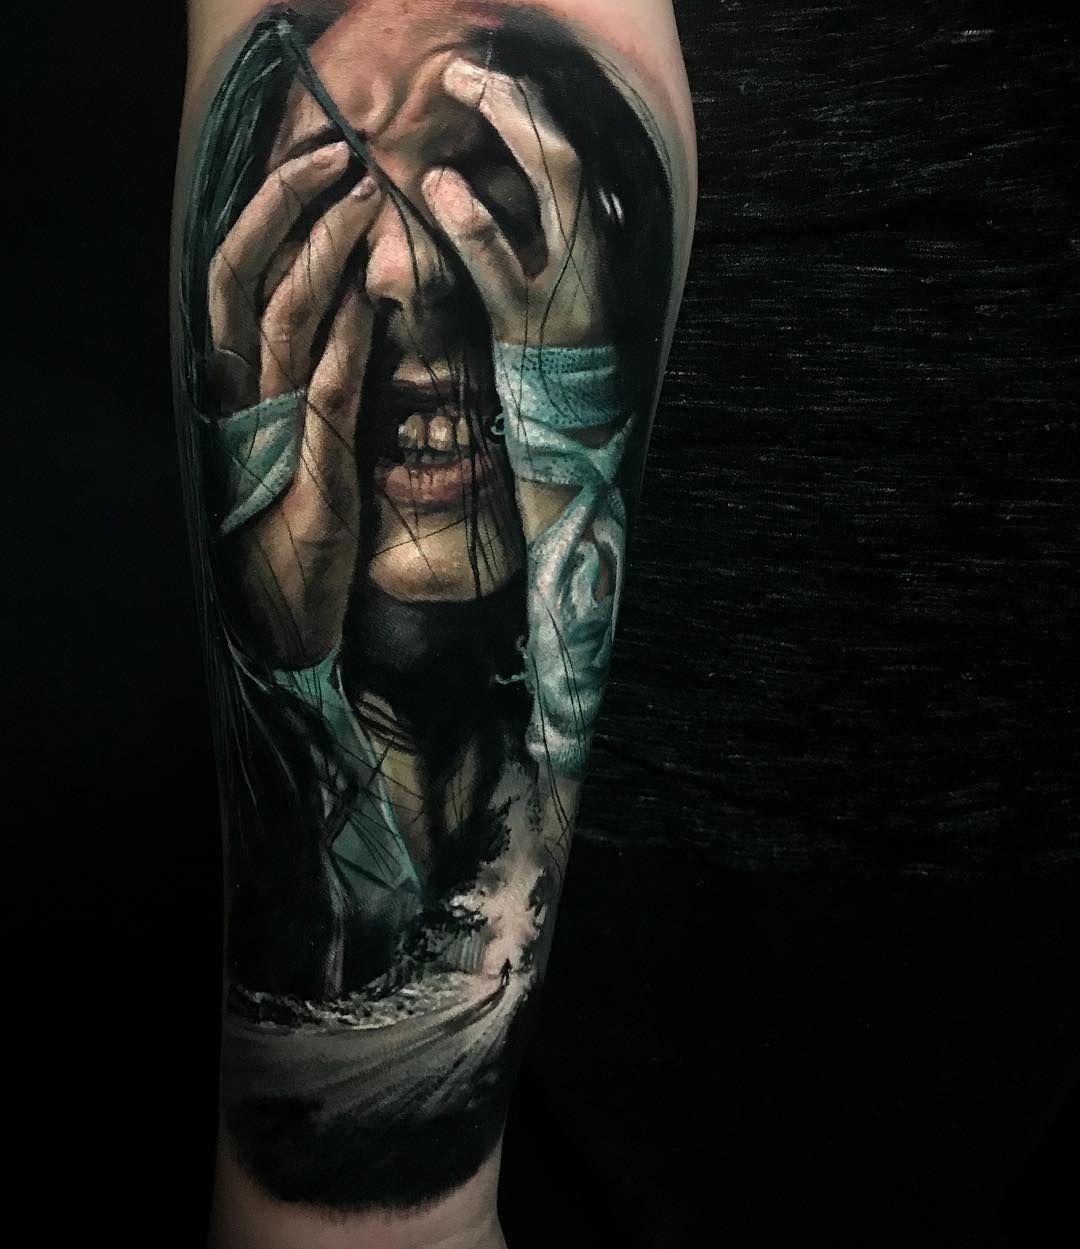 Tattoo Artist Damon Holleis Tatowierungen Tattoos Tatowieren